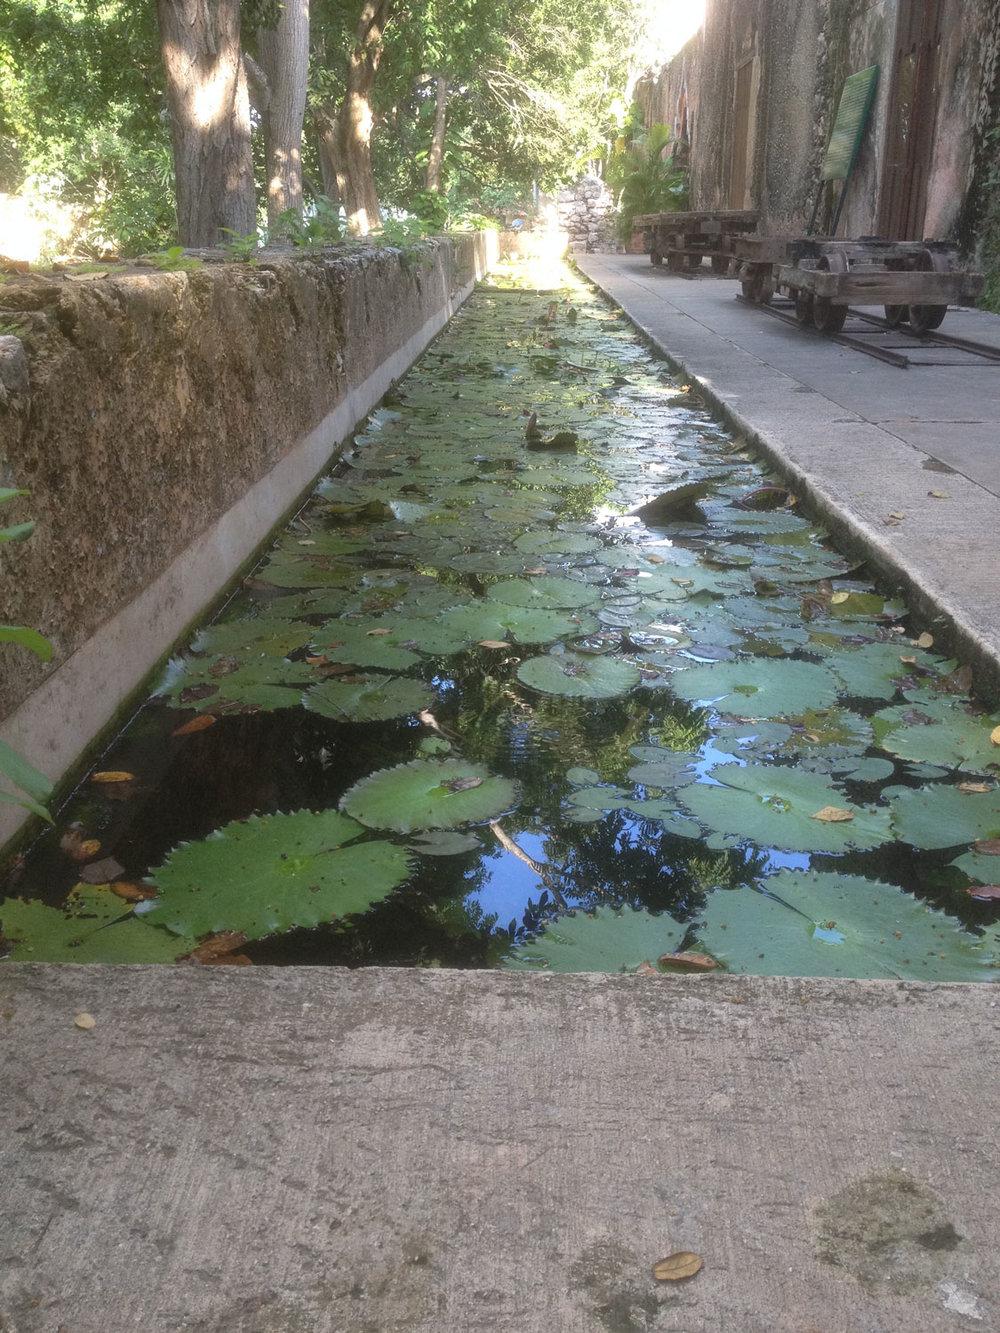 Hammocks_and_Ruins_Blog_Riviera_Maya_Mexico_Travel_Discover_Yucatan_What_to_do_Hacienda_Ochil_16.jpg